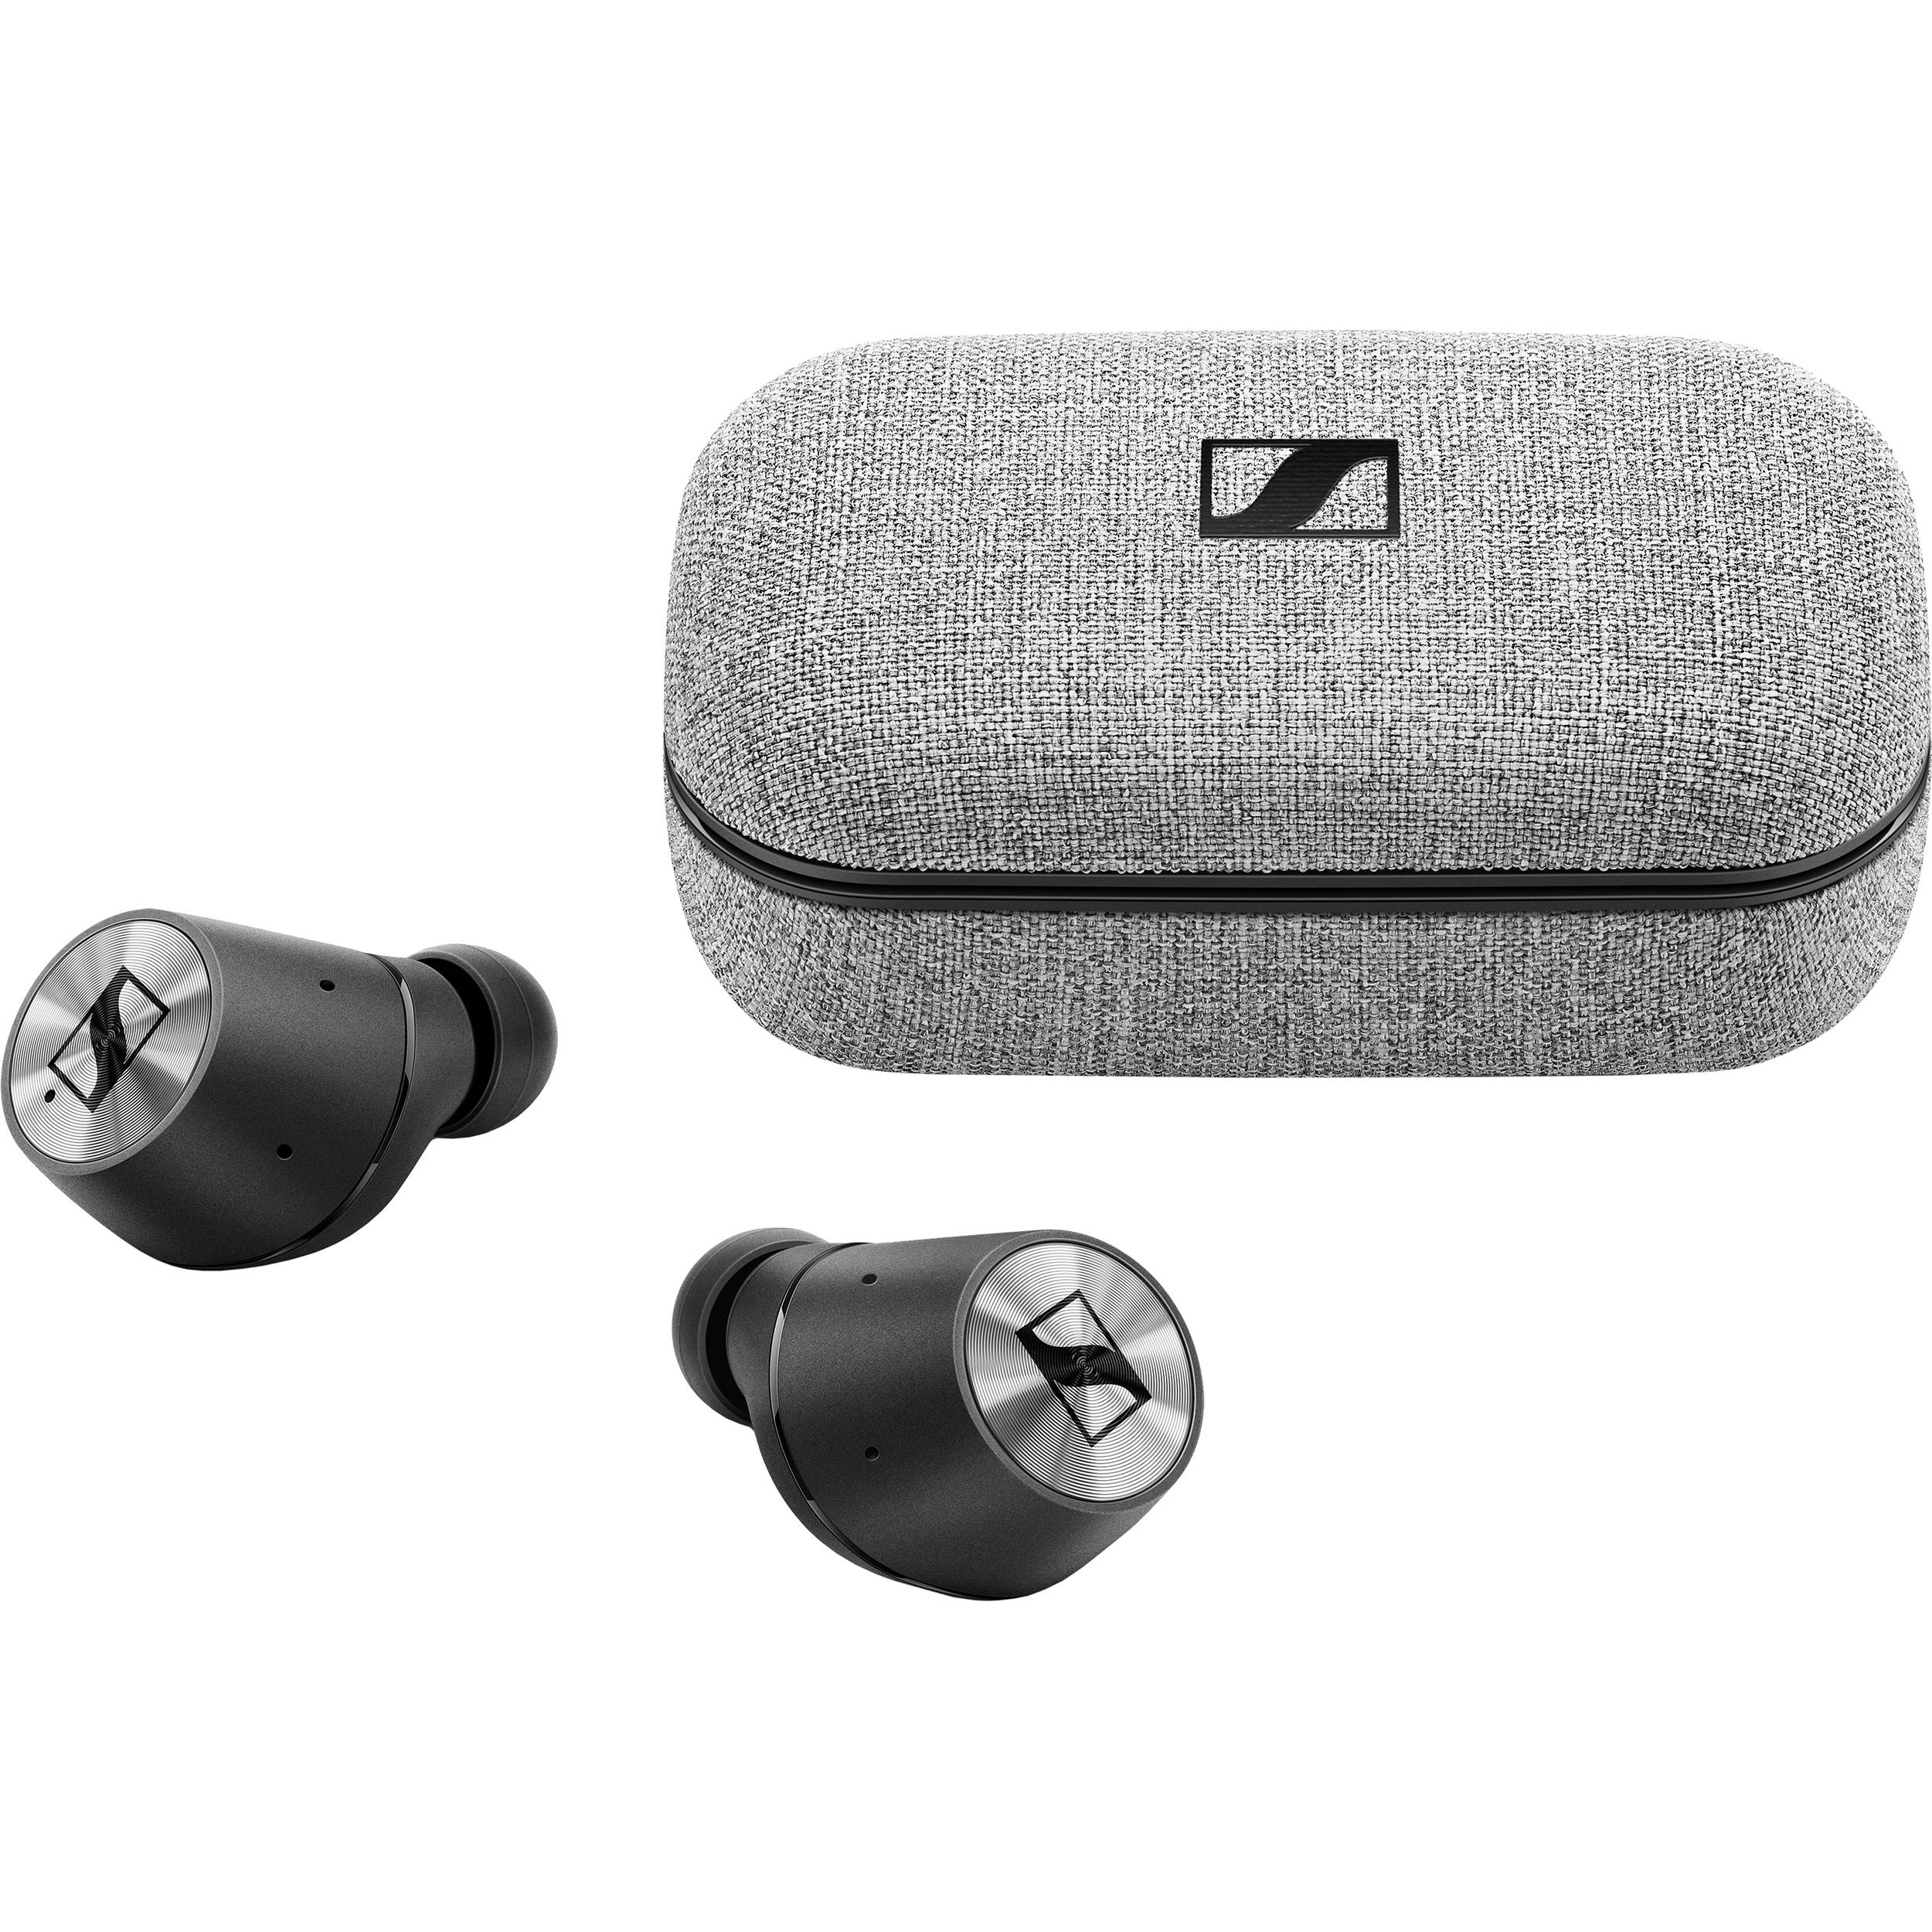 ed199763fcf Sennheiser MOMENTUM True Wireless Bluetooth In-Ear 508524 B&H